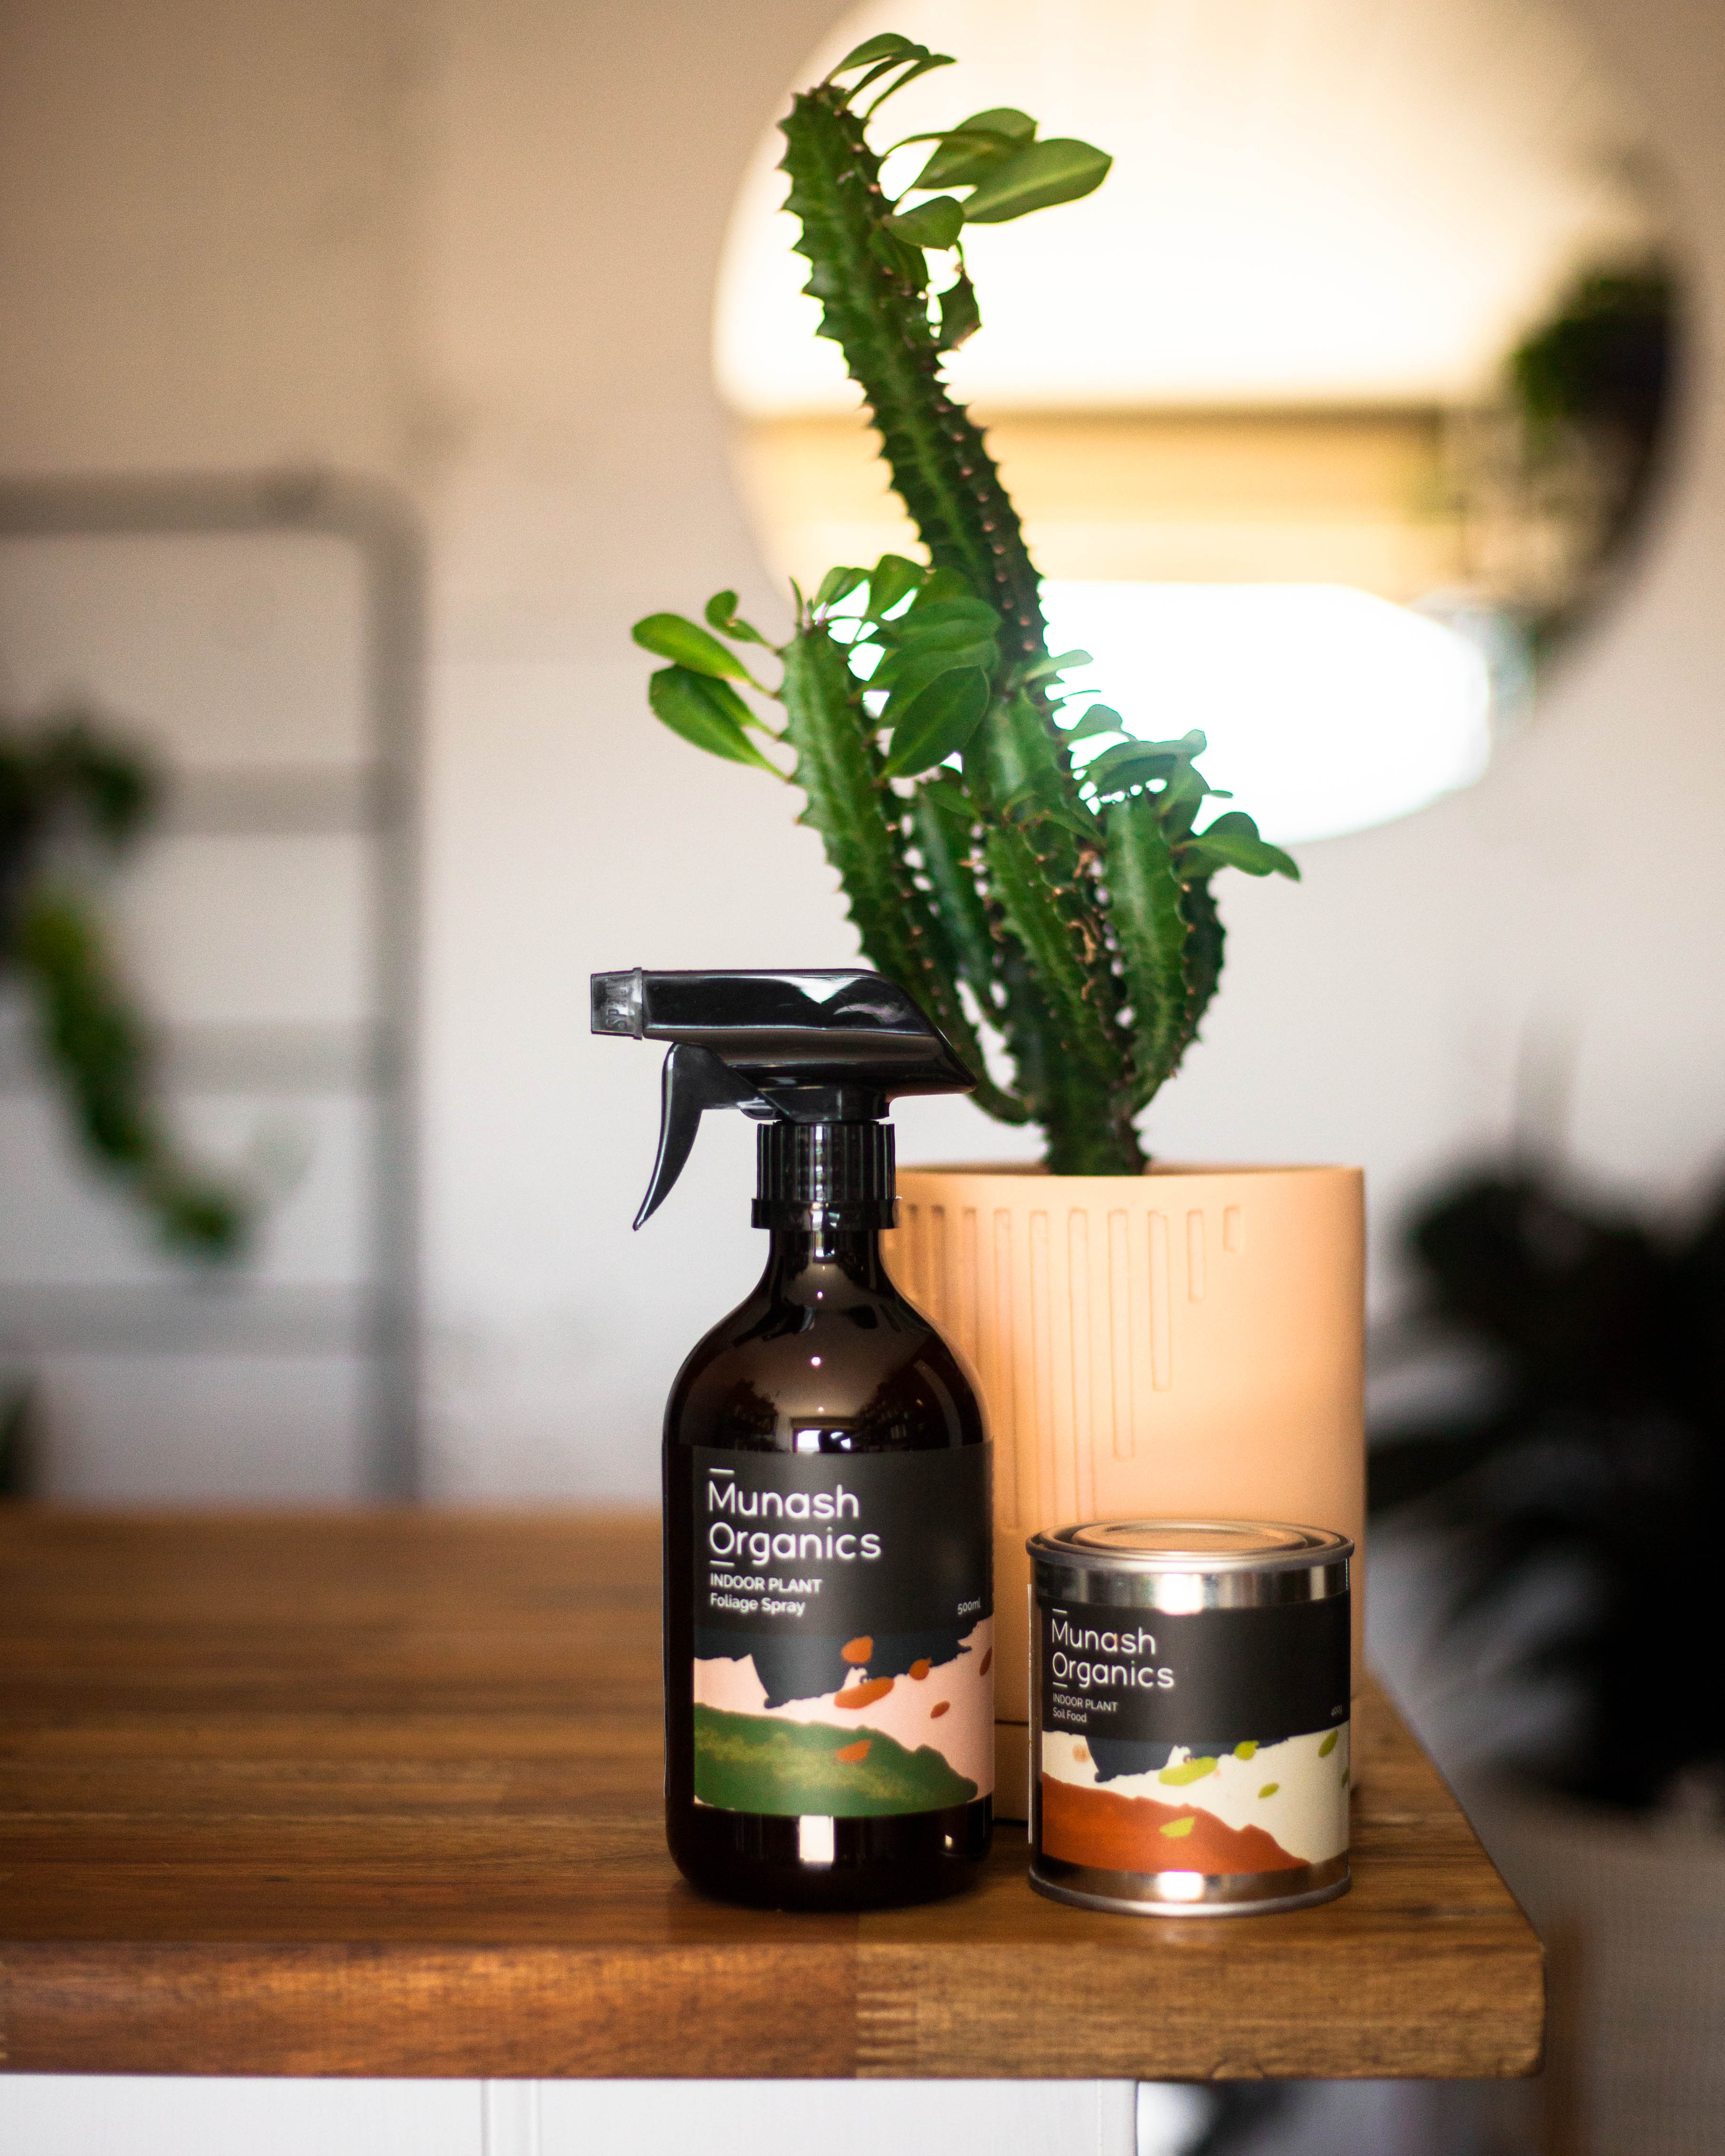 Munash Organics Soil Food and Foliage Spray